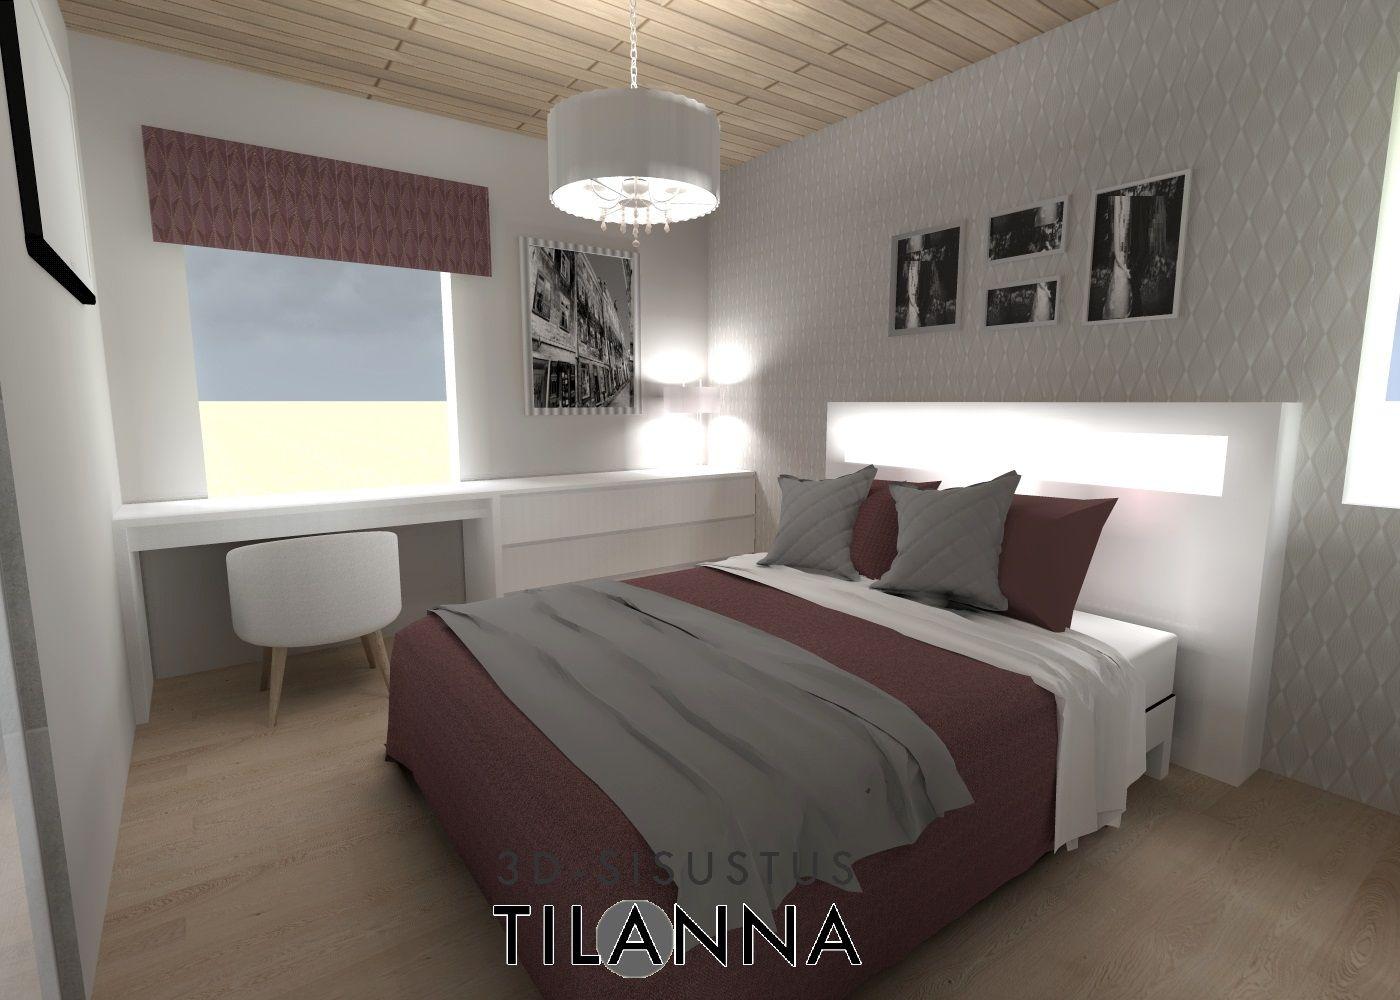 Modern Romantic Bedroom 3d Sisustussuunnittelu Moderni Romanttinen Makuuhuone Modern